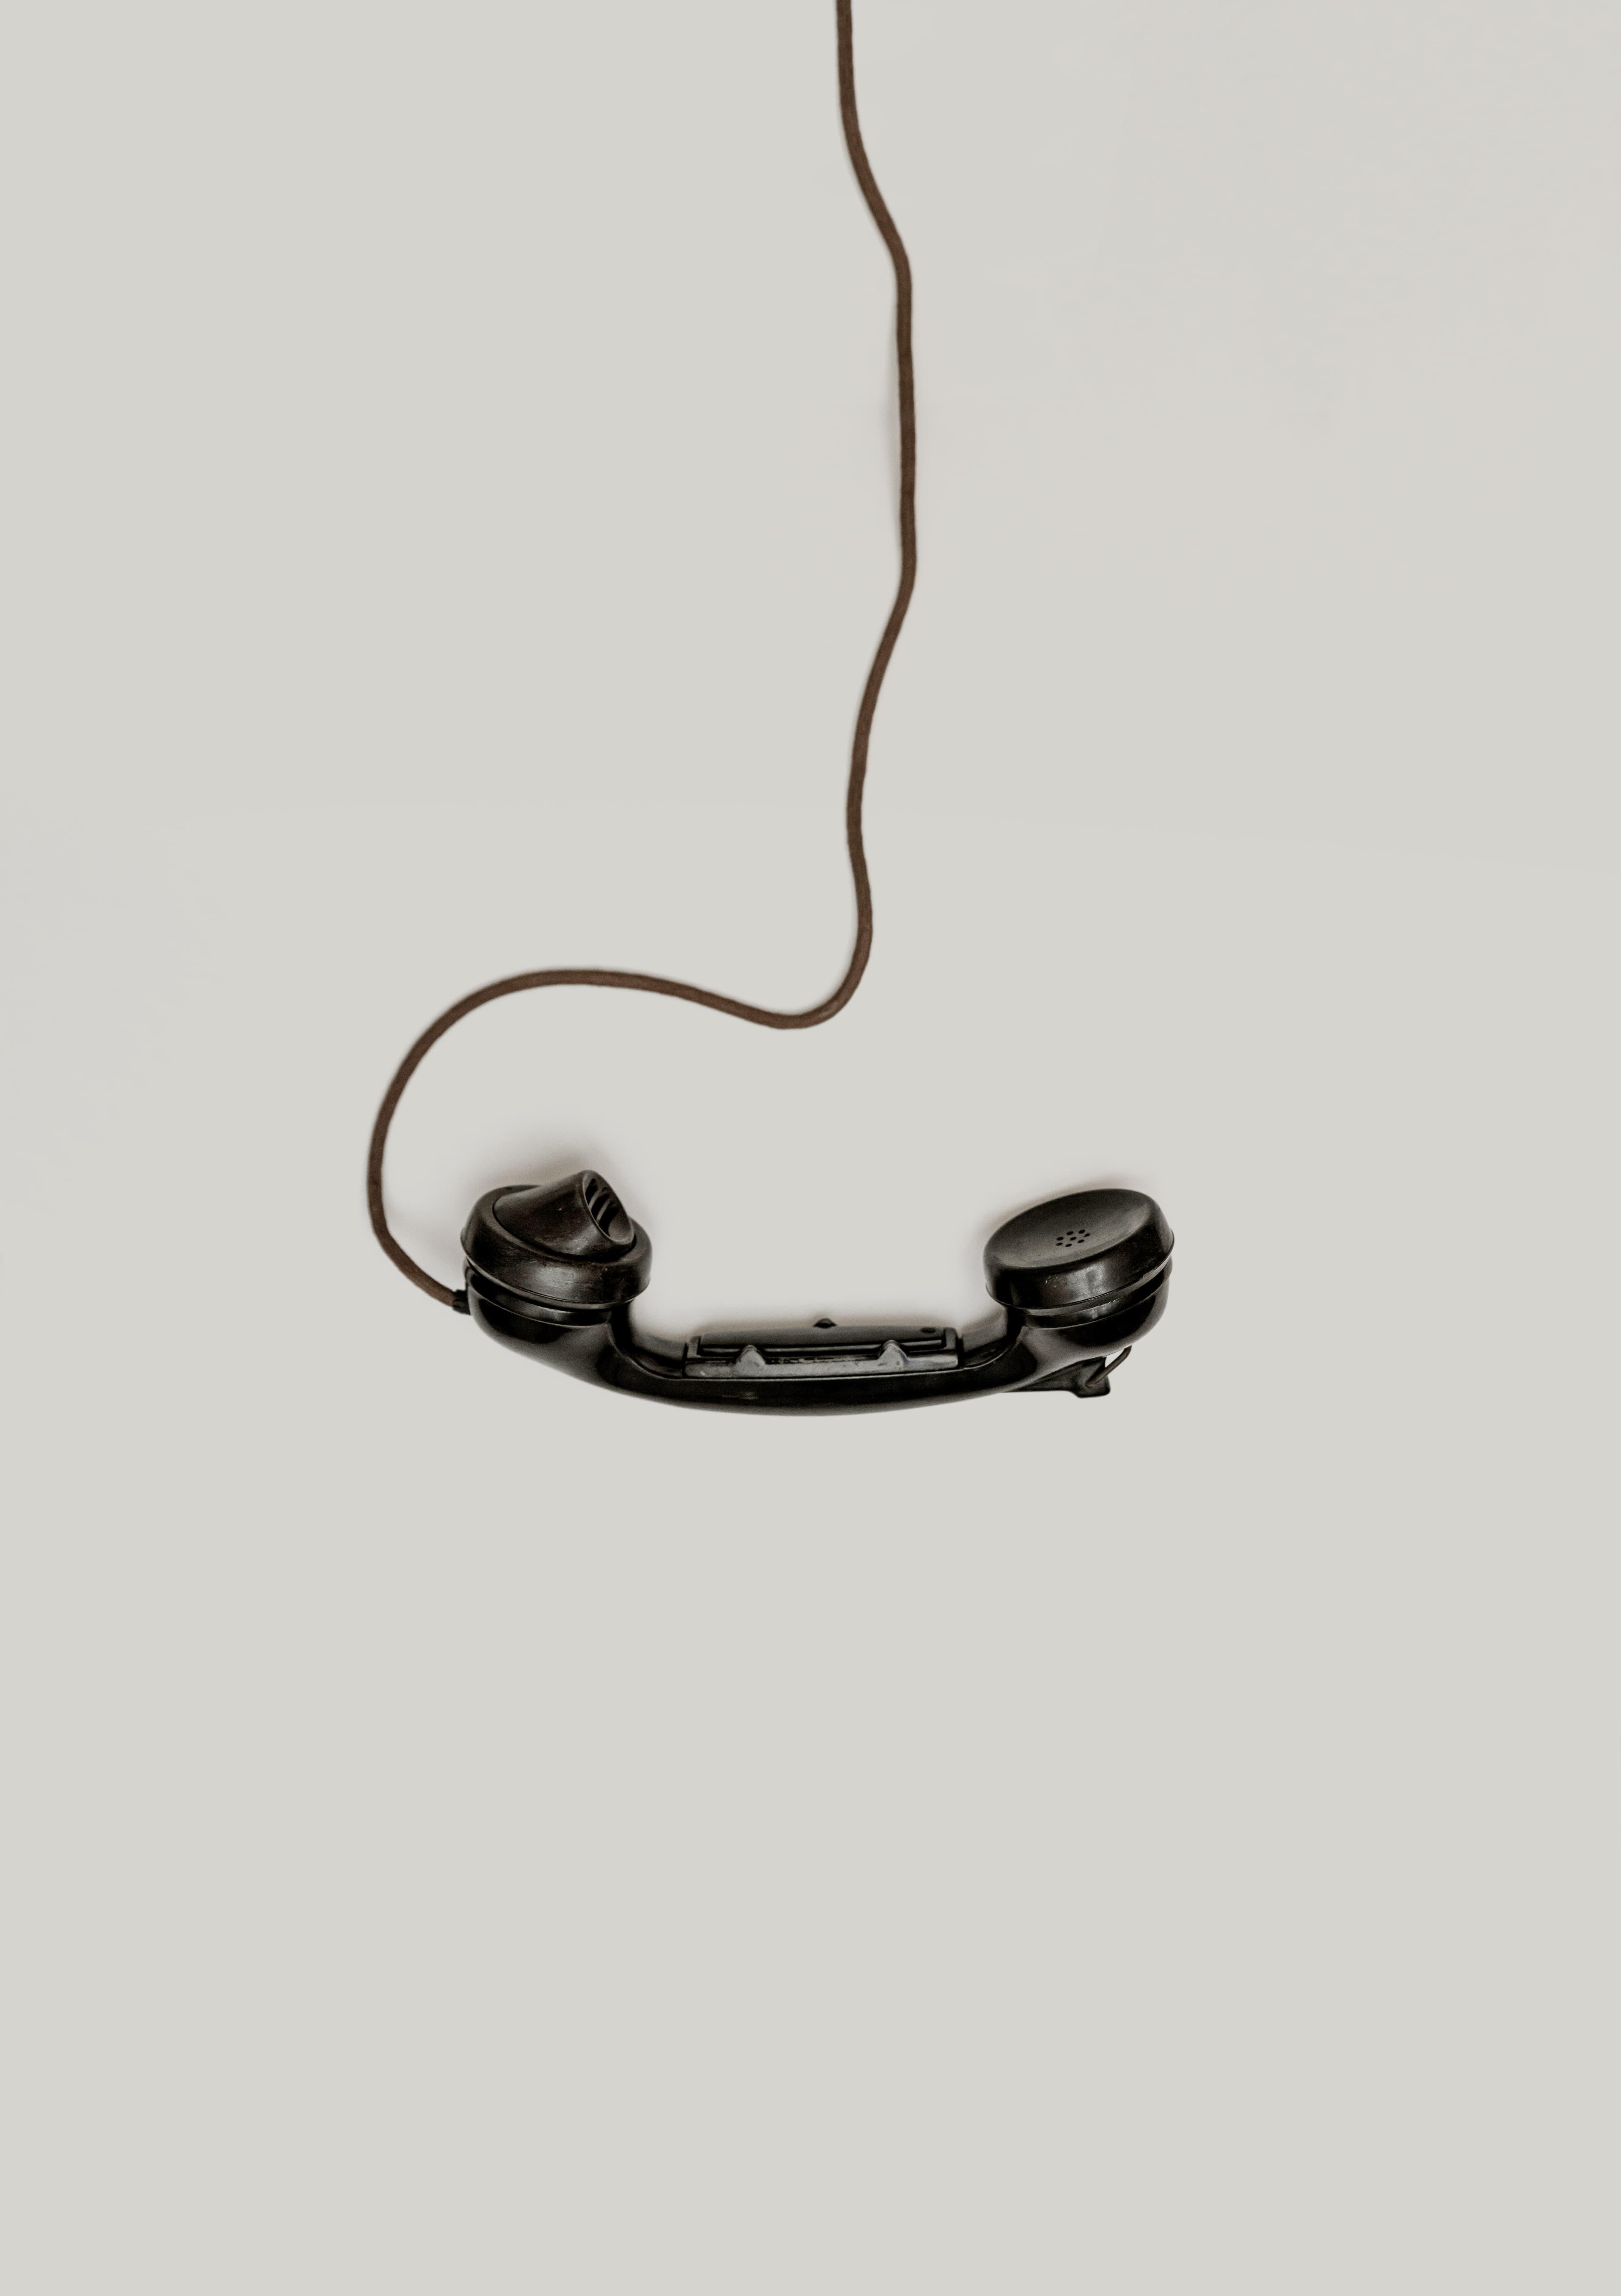 Phone - Photo by Alexander Andrews on Unsplash